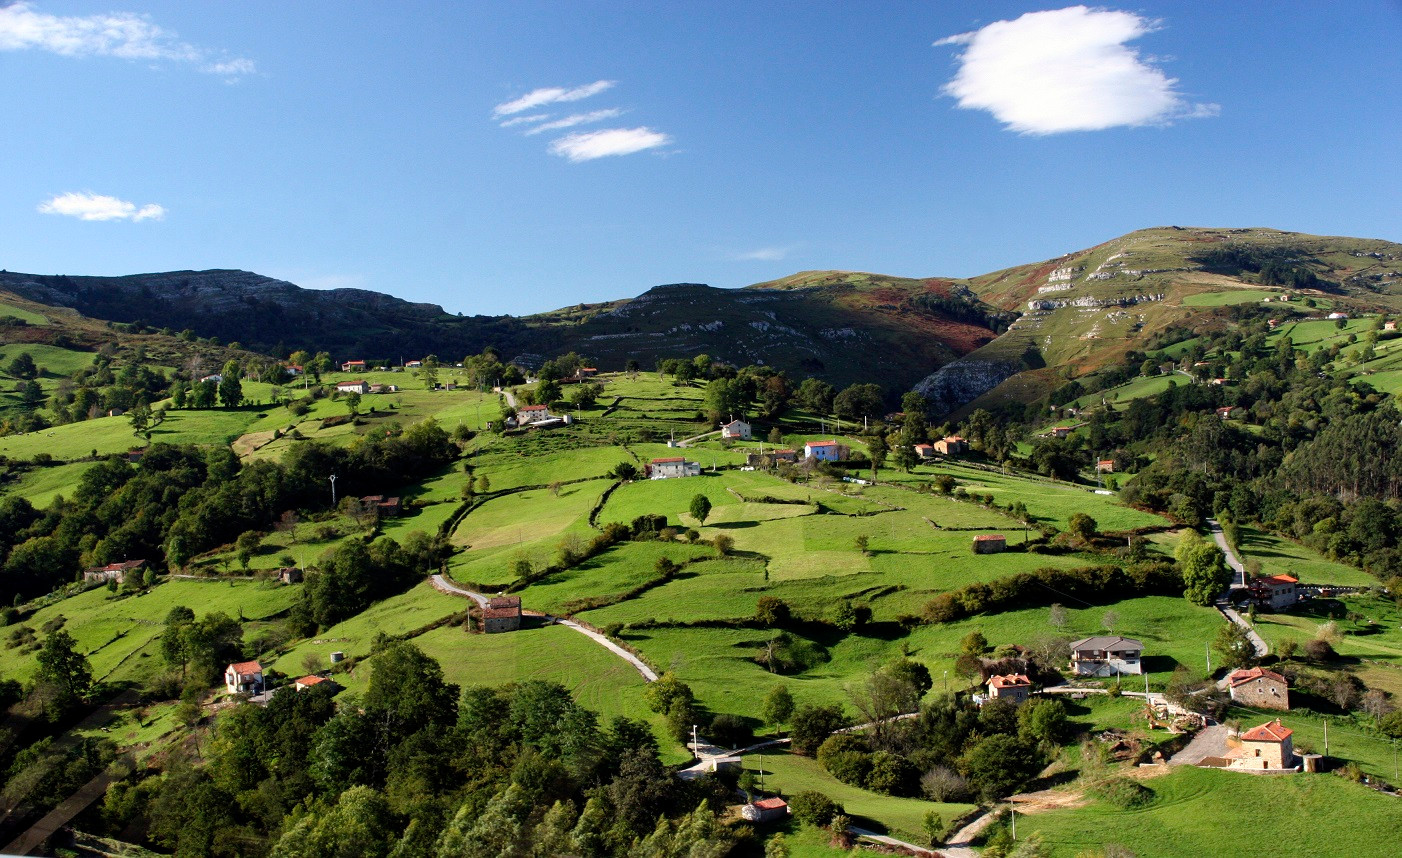 pasiegos valleys